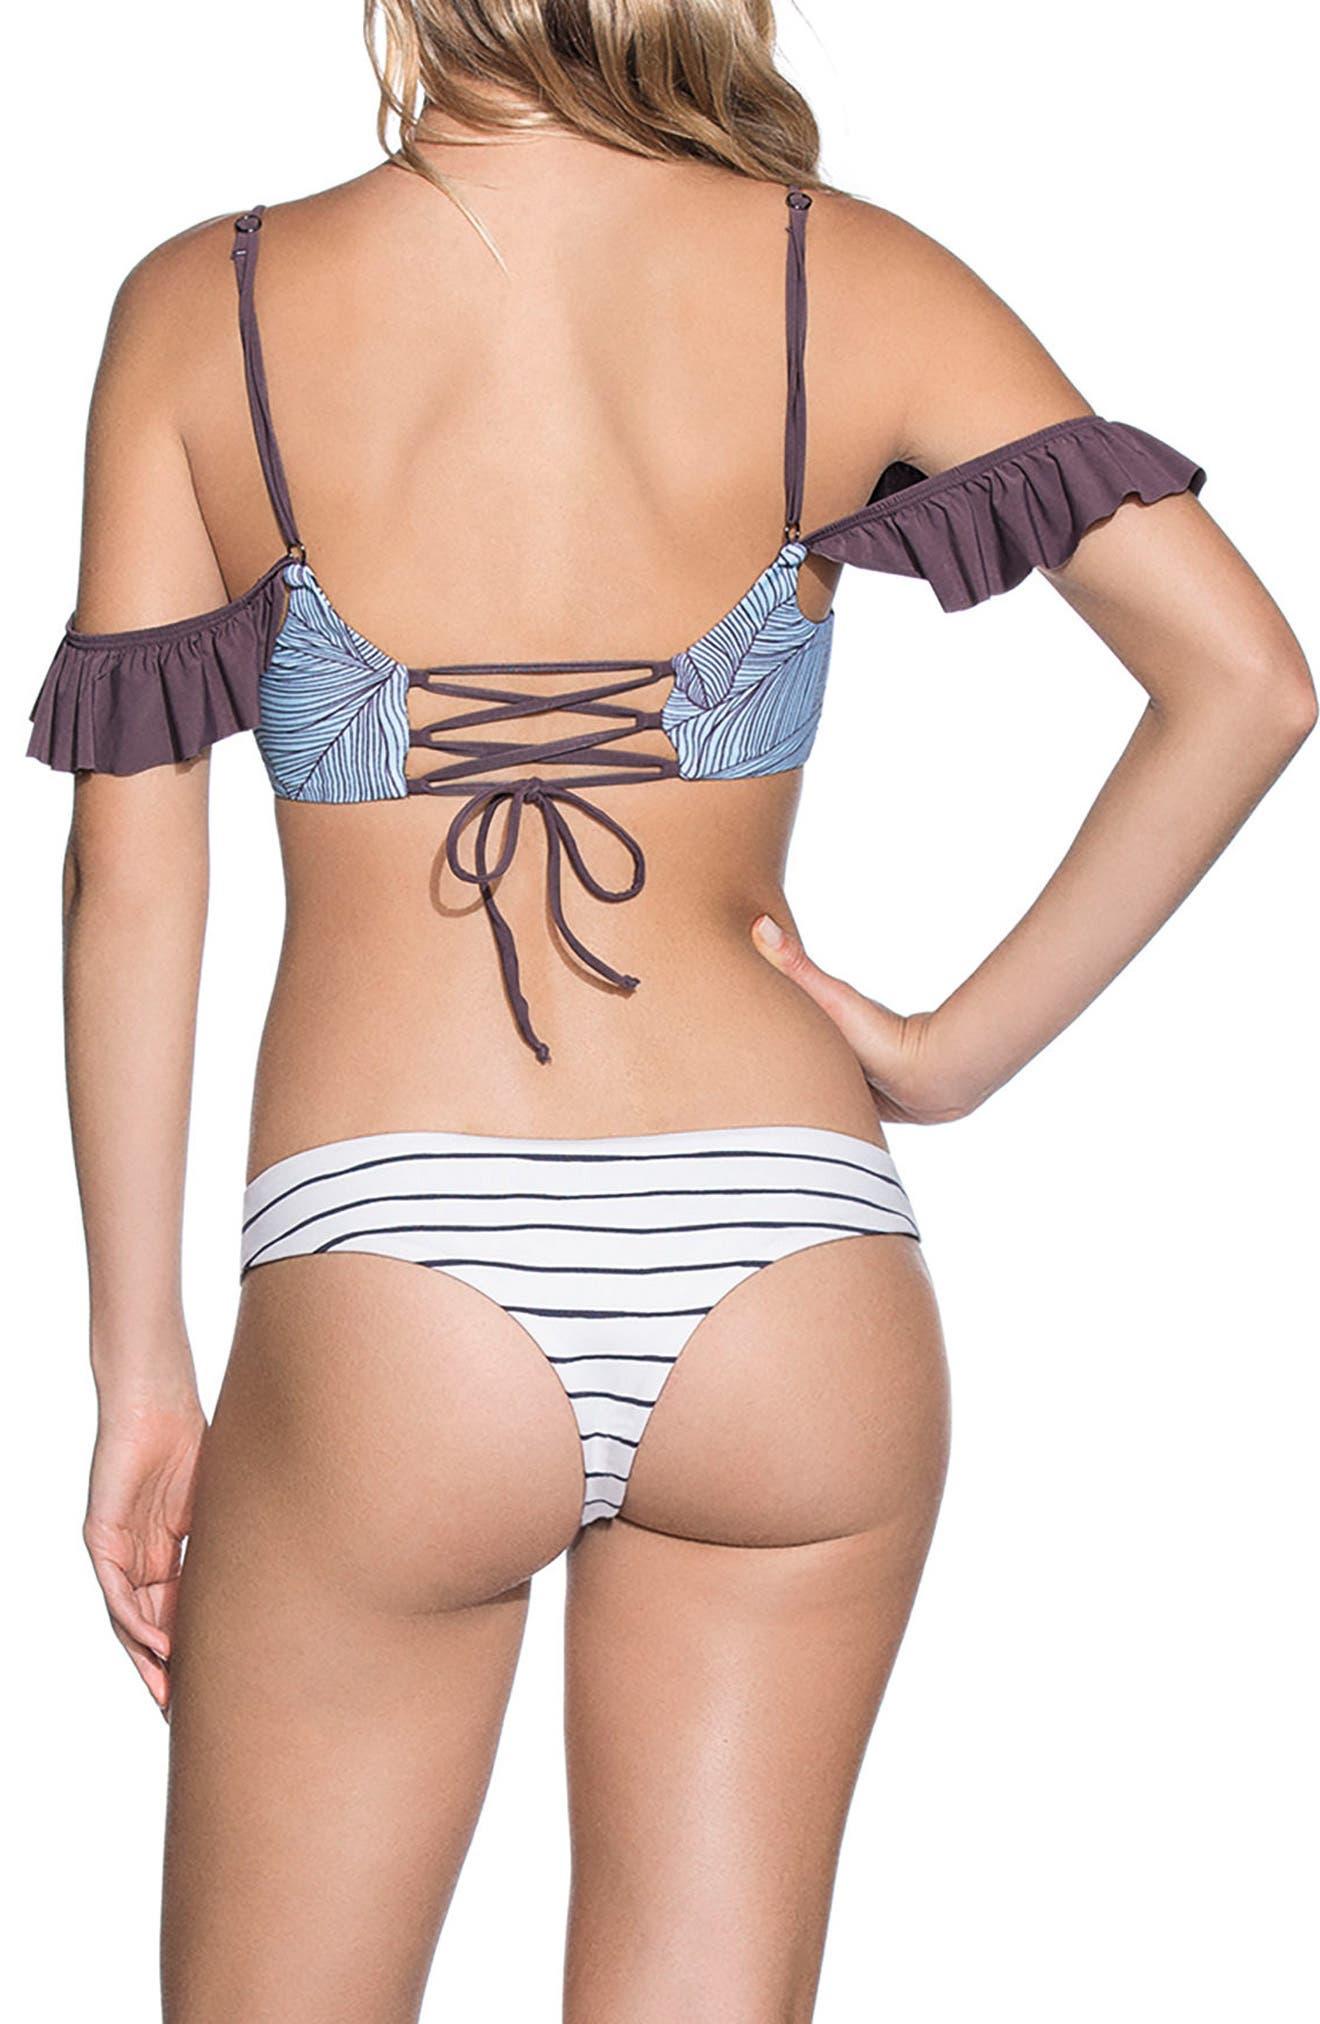 Sierra Nevada Off the Shoulder Reversible Bikini Top,                             Alternate thumbnail 4, color,                             Purple Multi